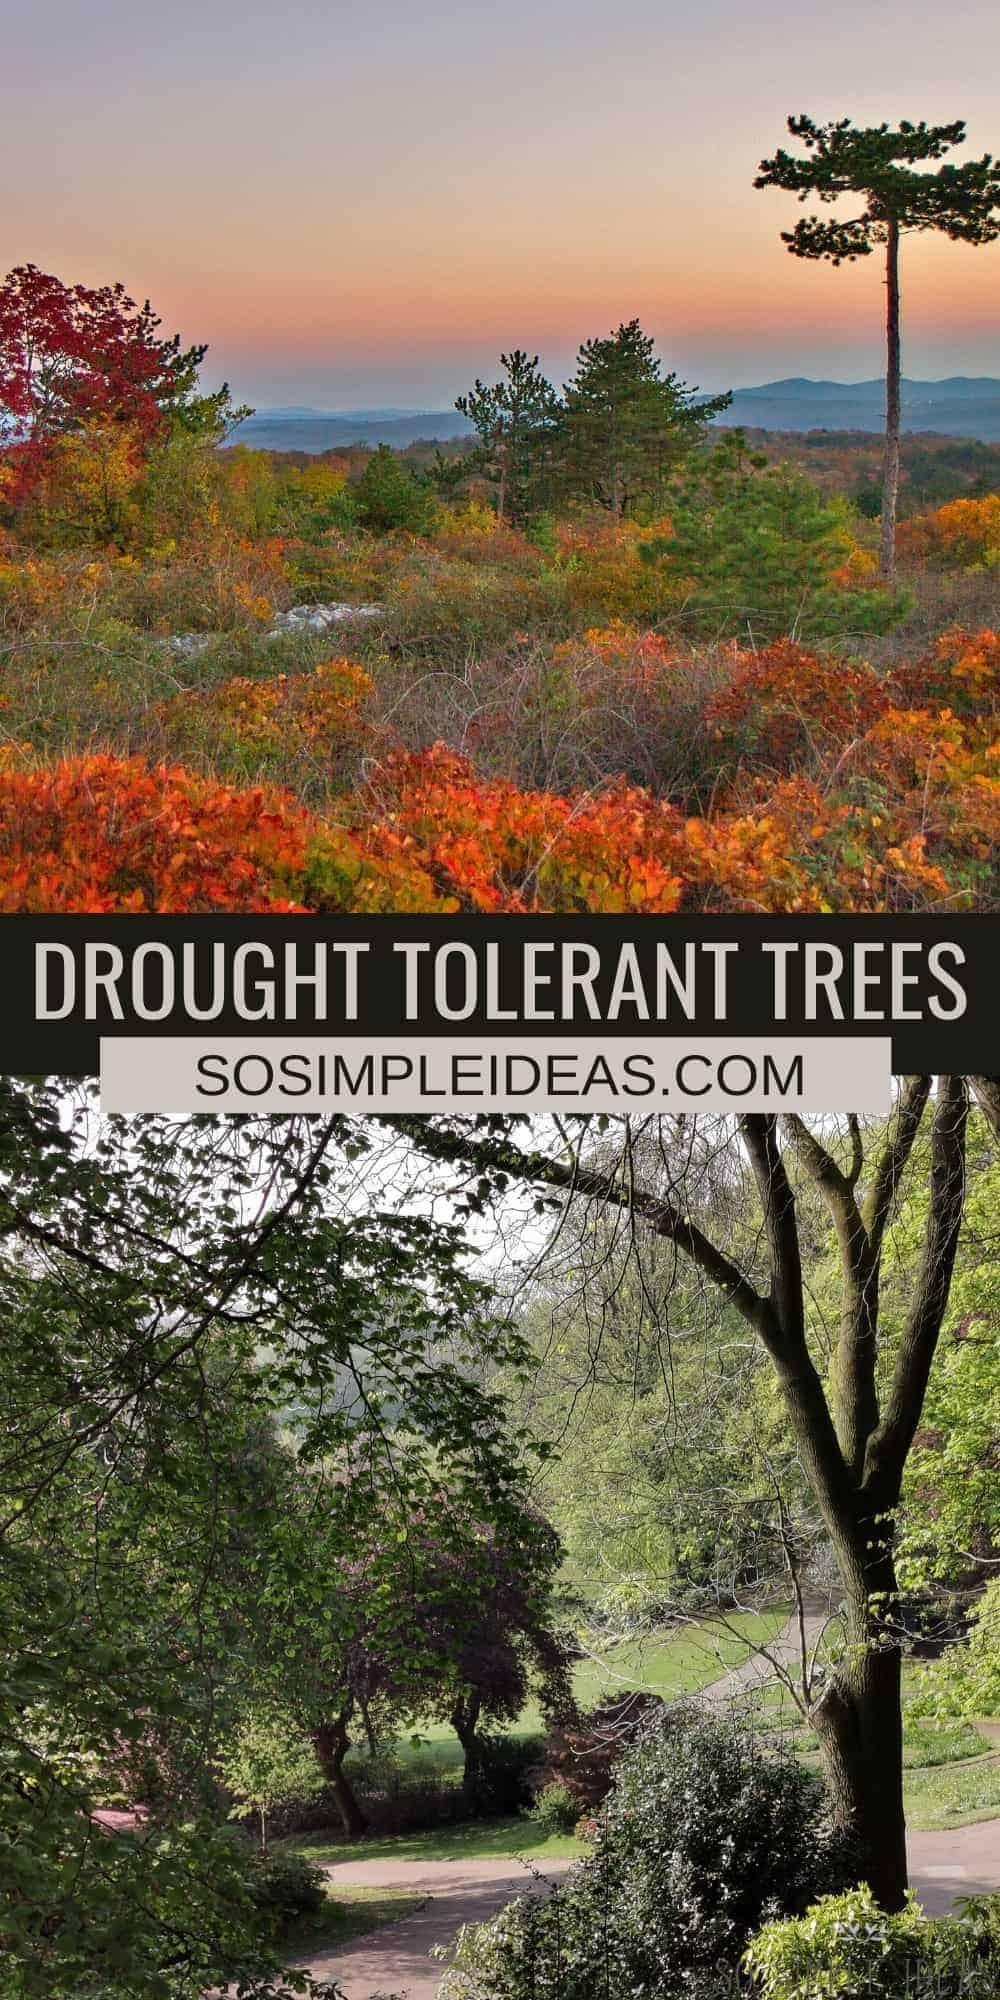 drought tolerant trees pinterest image